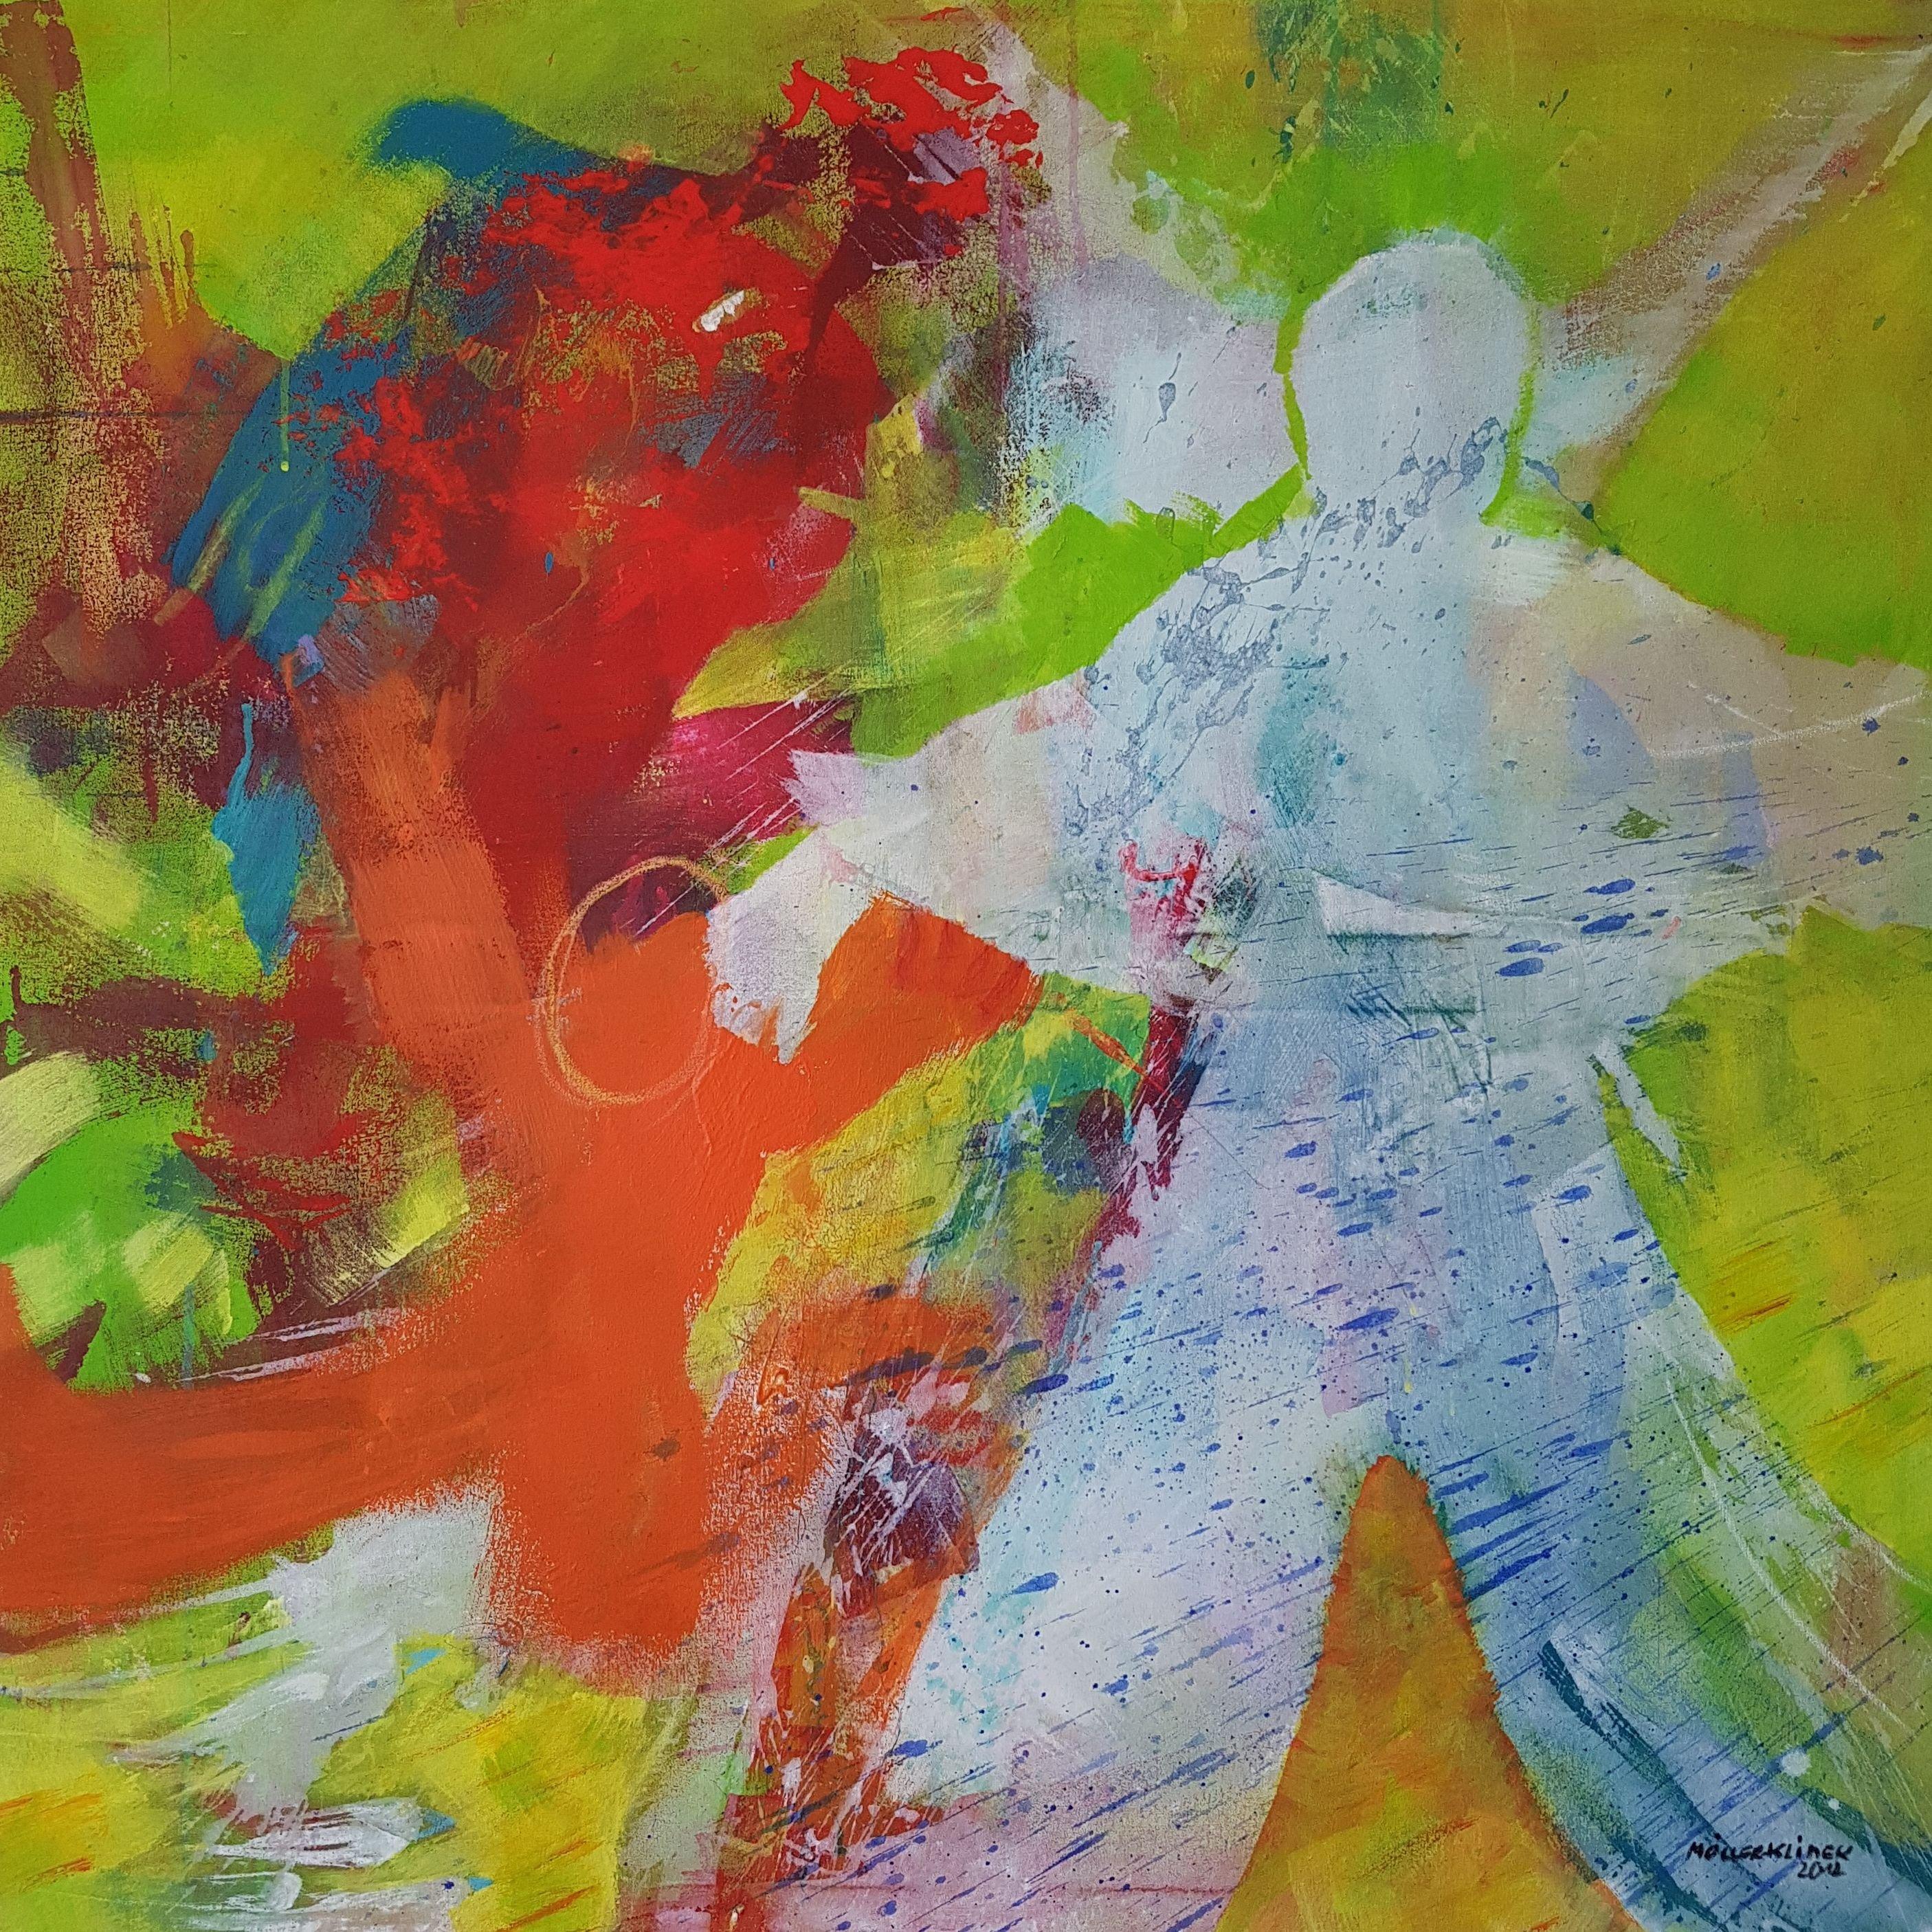 Ausstellung_Birgit_Moeller-Klimek_05.11..jpg